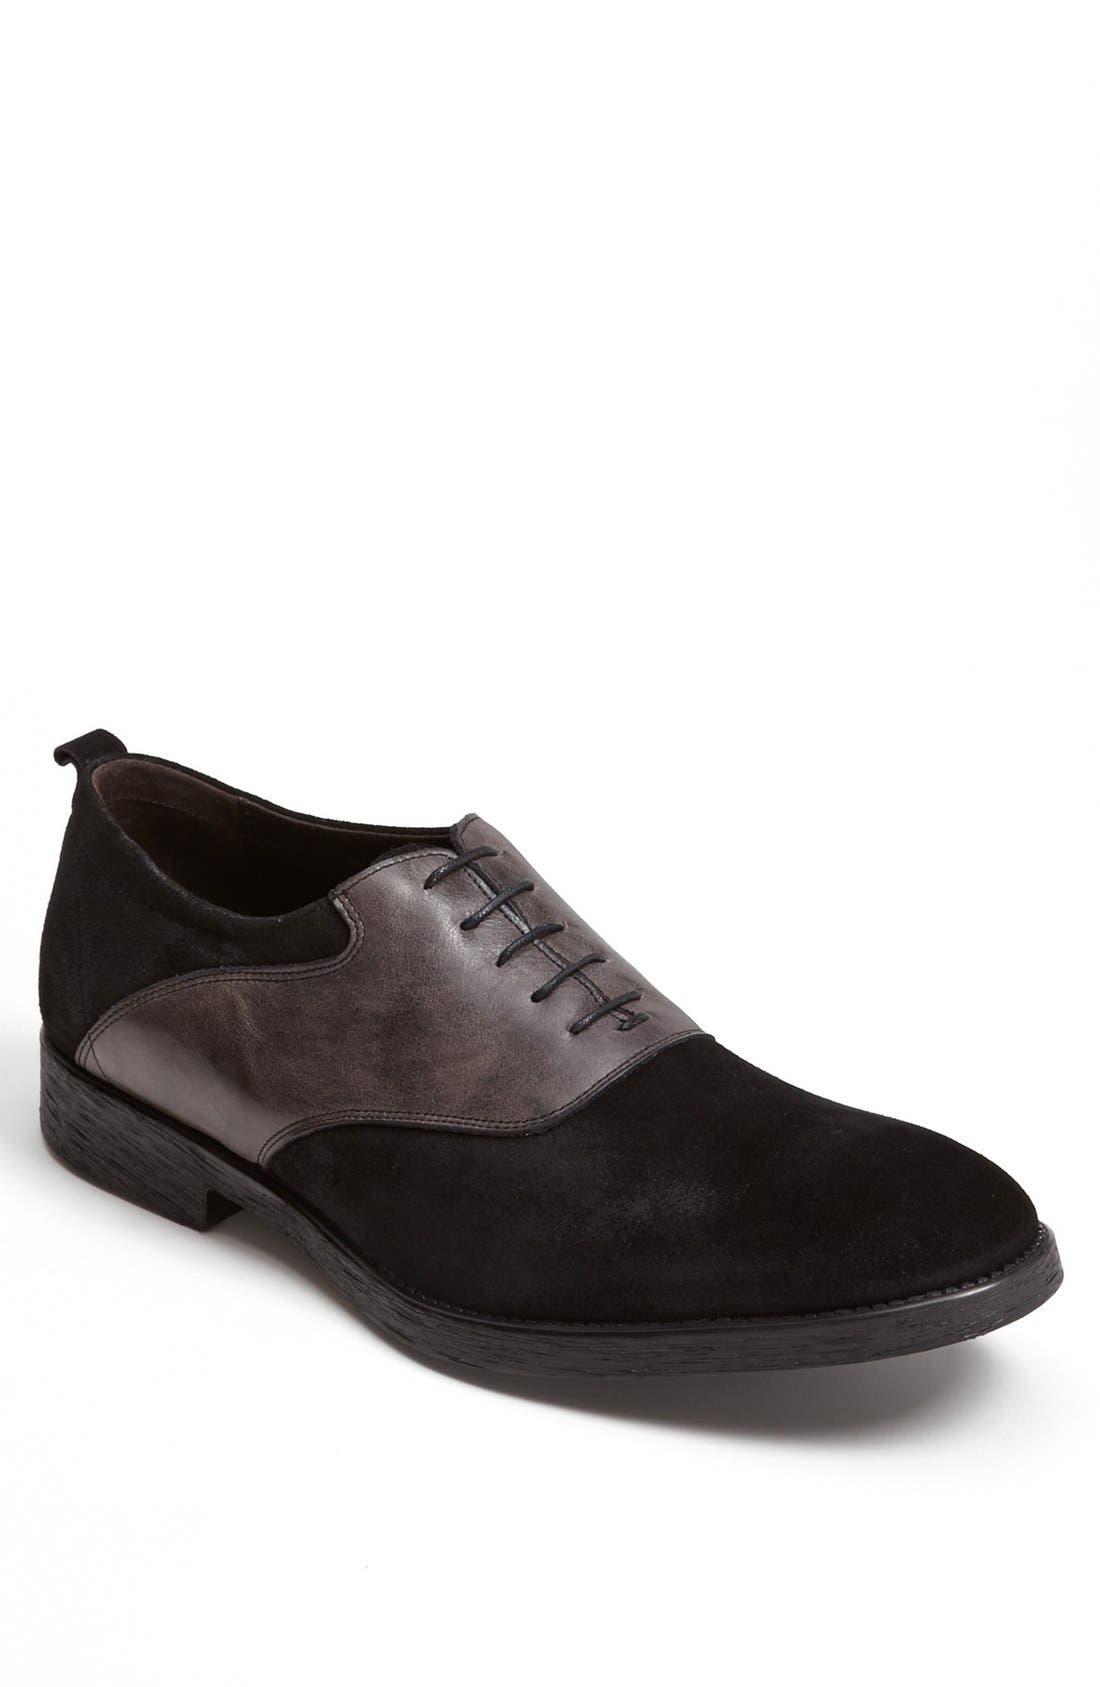 Main Image - Wallin & Bros. 'Jacobs' Saddle Shoe